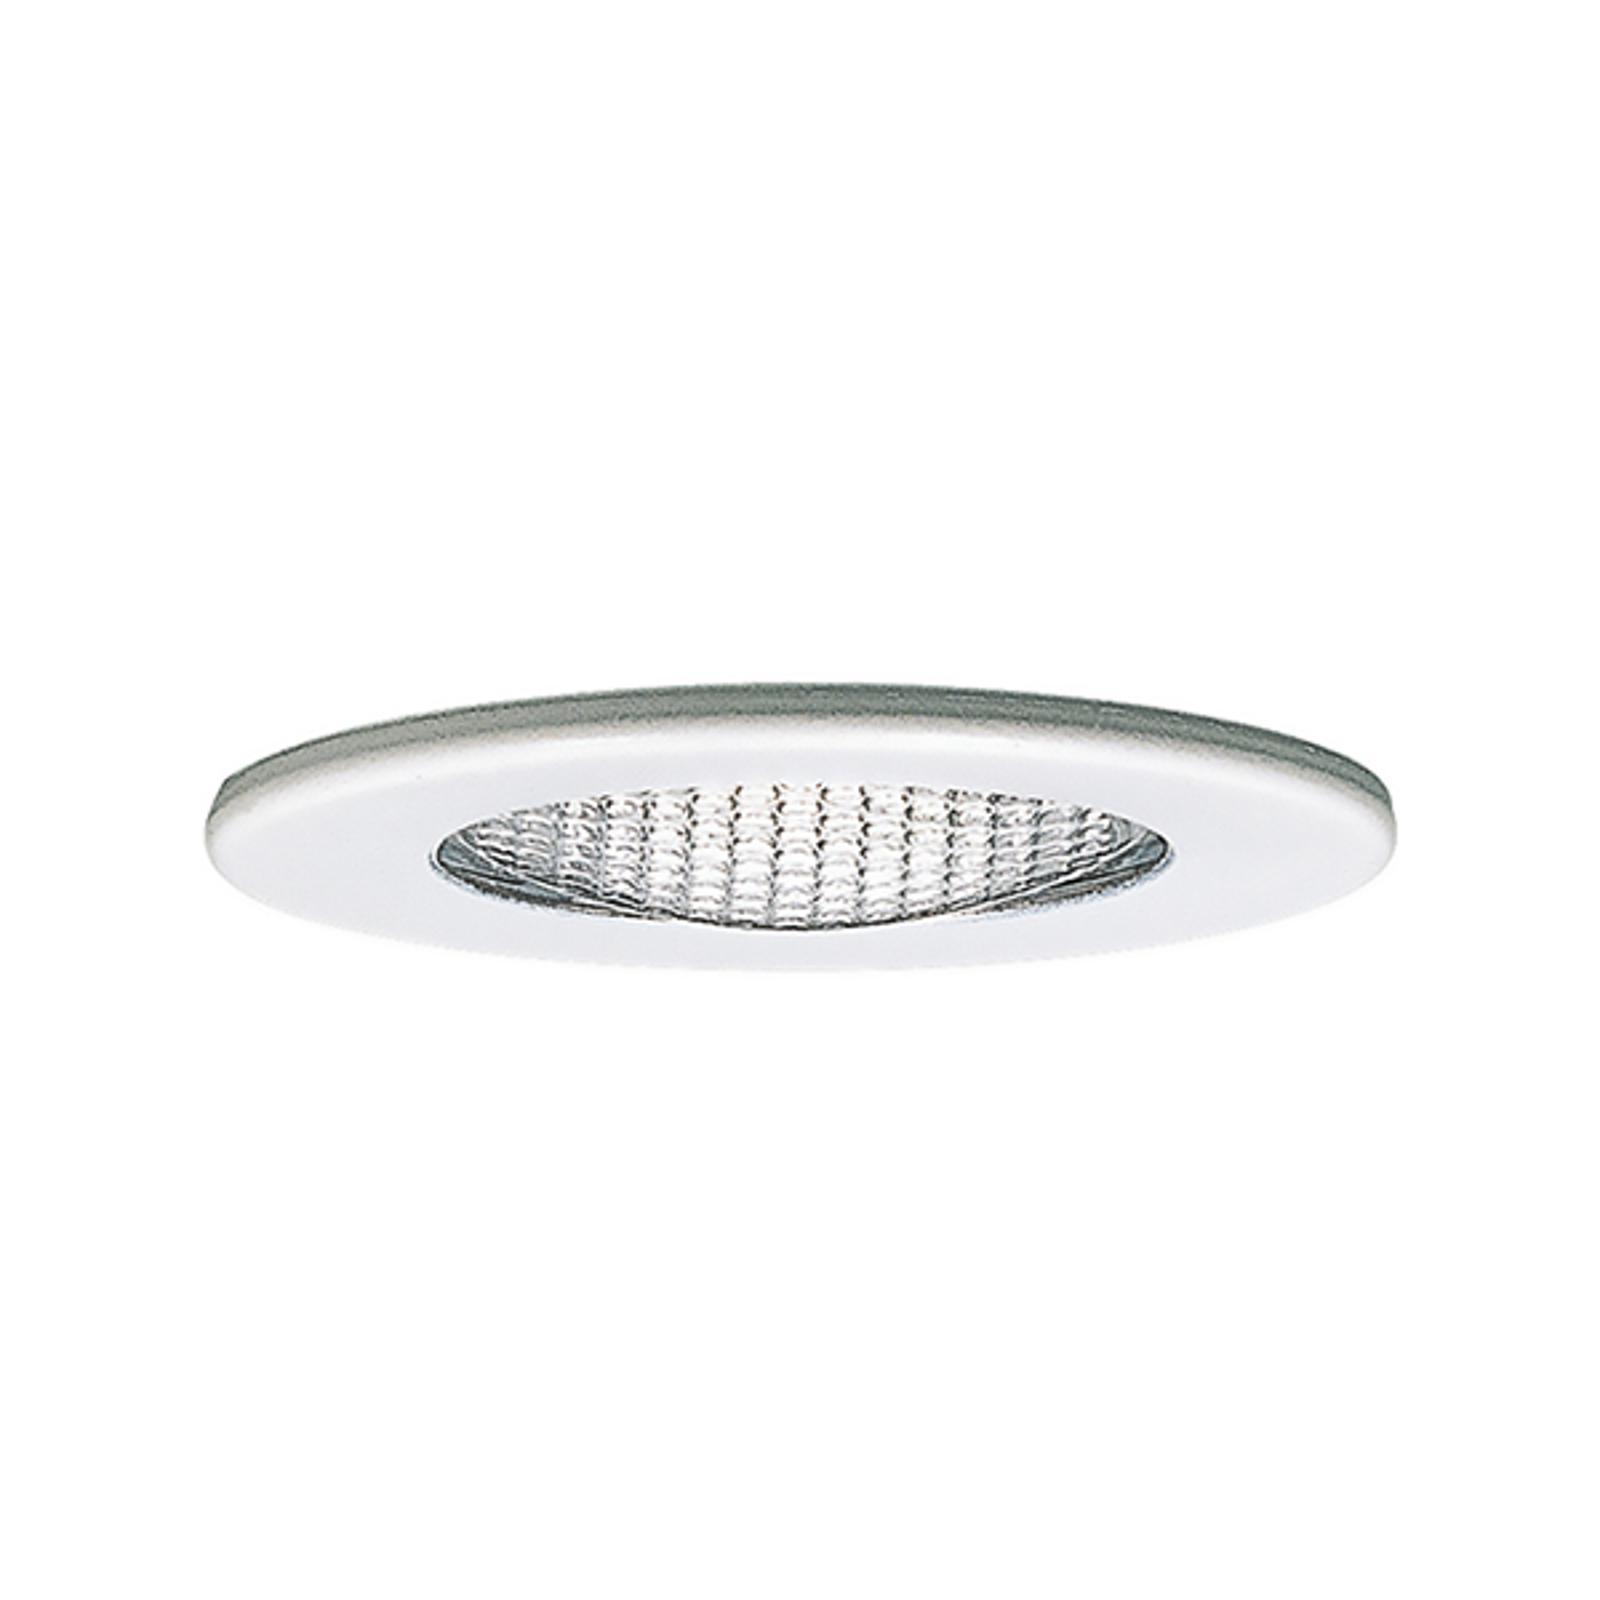 Hvit innfelt lampe Gave, 1x 20 G4 | Lampegiganten.no